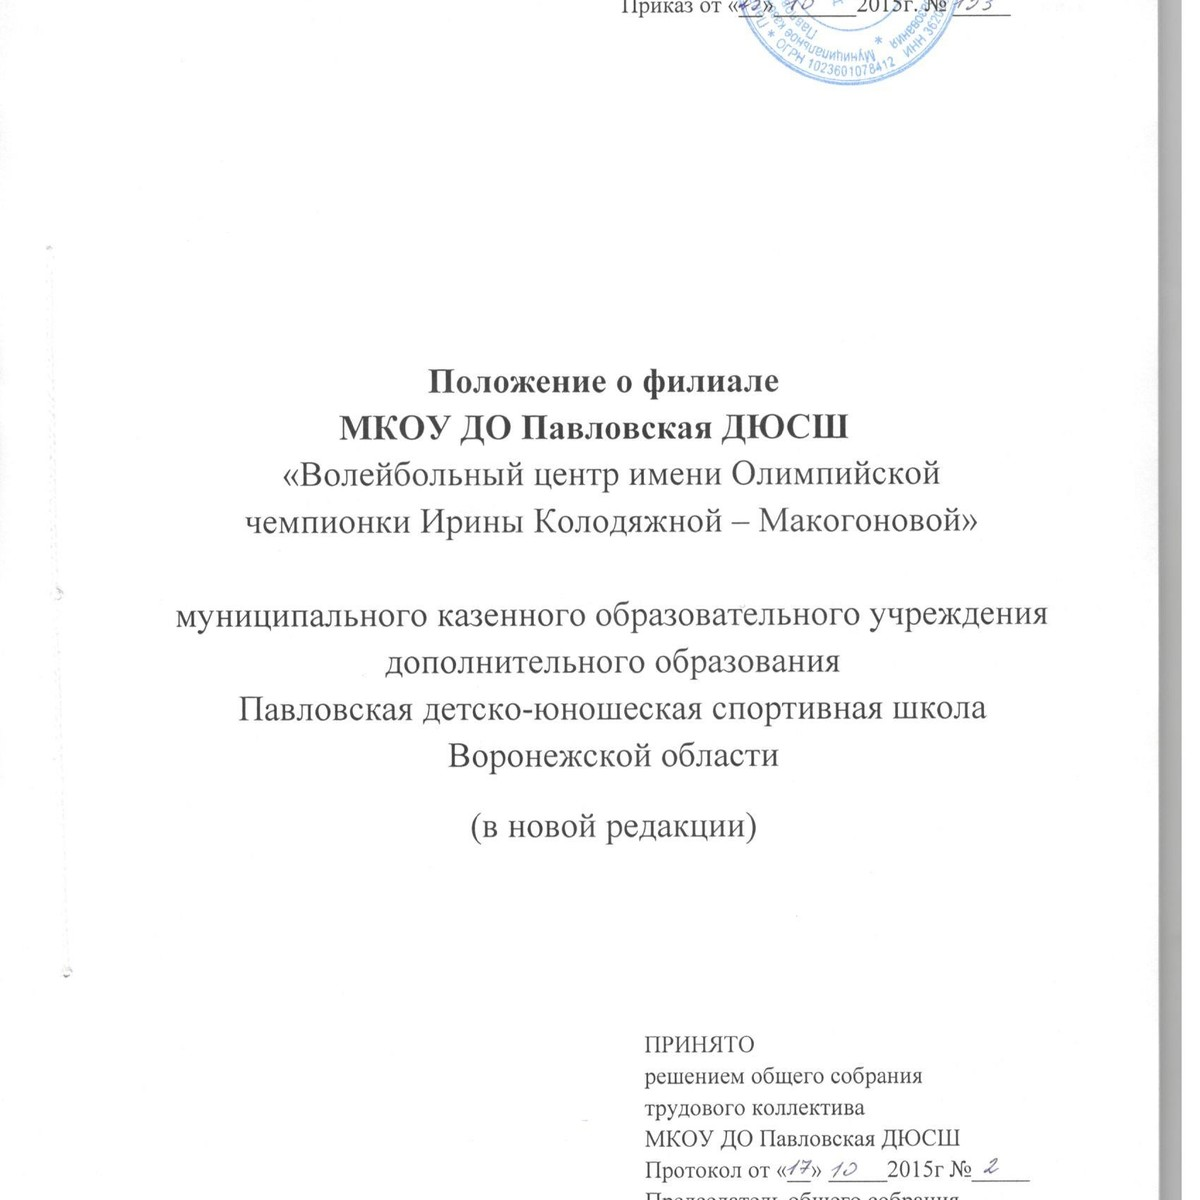 Целевое назначение дюсш образ и назначение выпускника